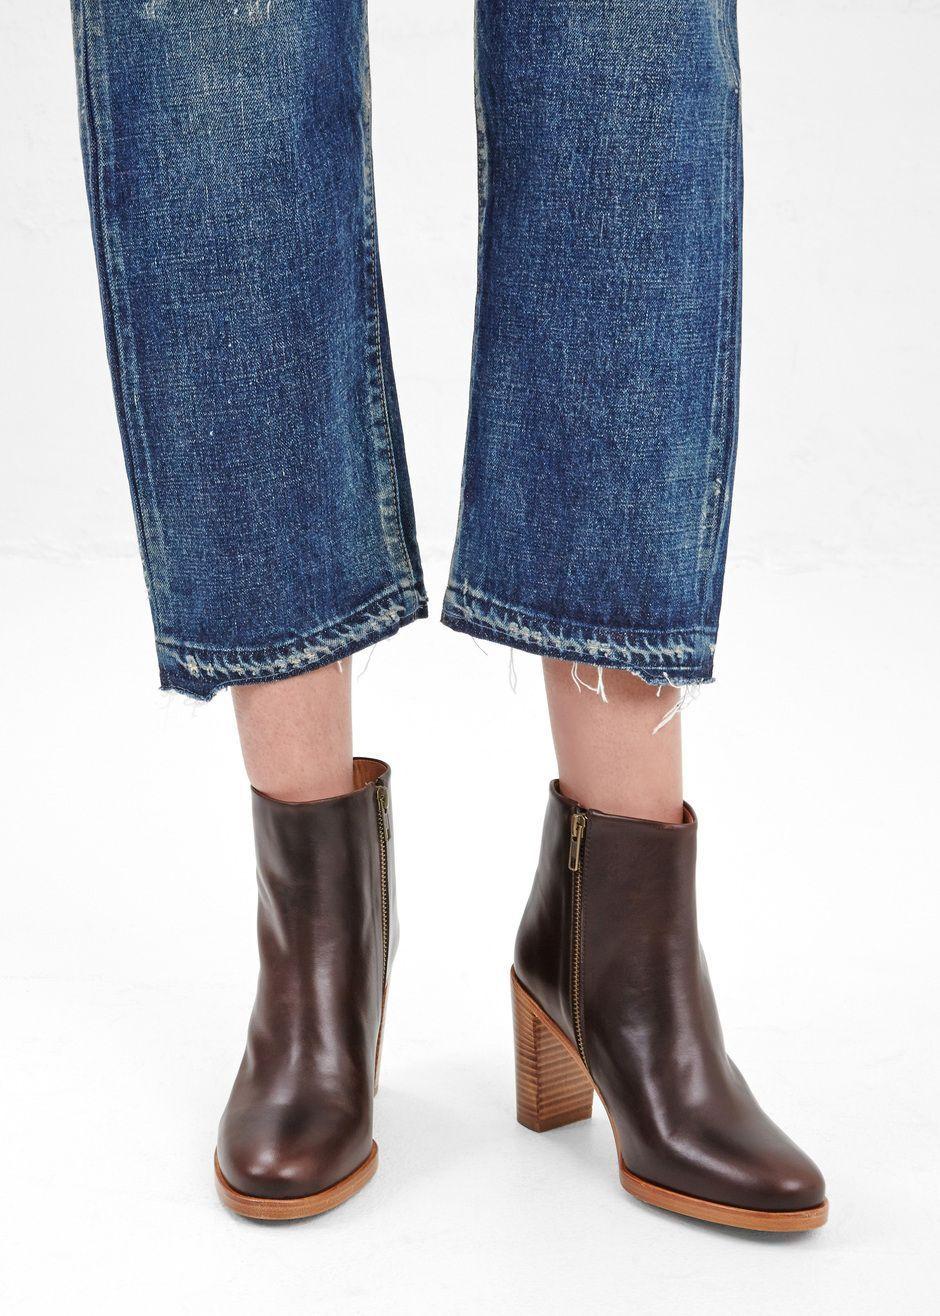 negozio outlet APC Rachel Marrone Leather Ankle stivali stivali stivali 3.5  stacked heel Inside Zip  migliore offerta